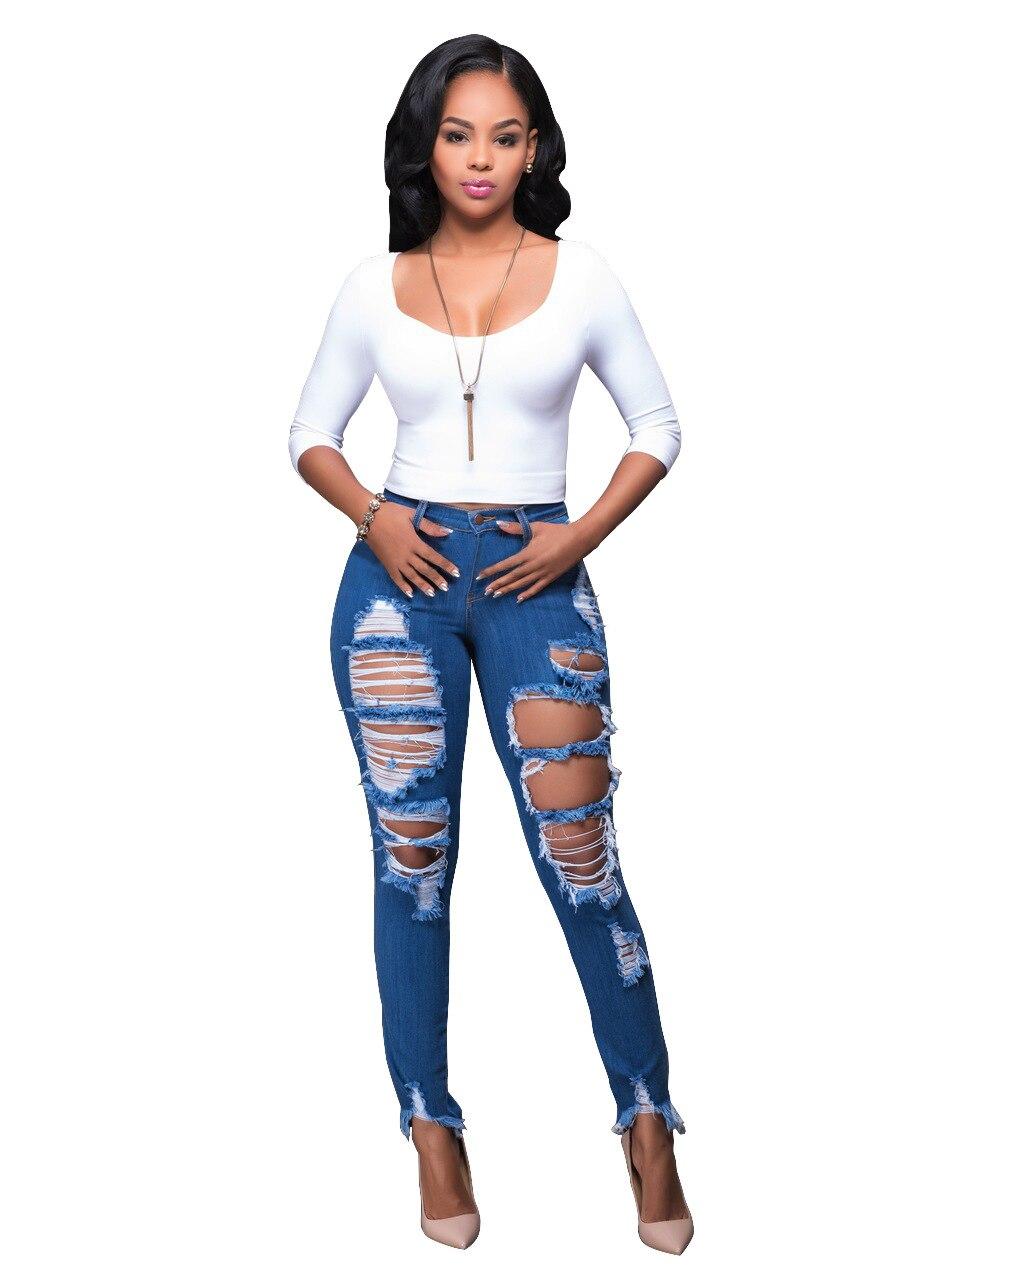 Plus Size Boyfriend Jeans for Women Streetwear Ripped Distressed High Waist Stretch Skinny Trousers Denim Push Up Slim Femme Jeans Women Bottom ! Plus Size Women's Clothing & Accessories